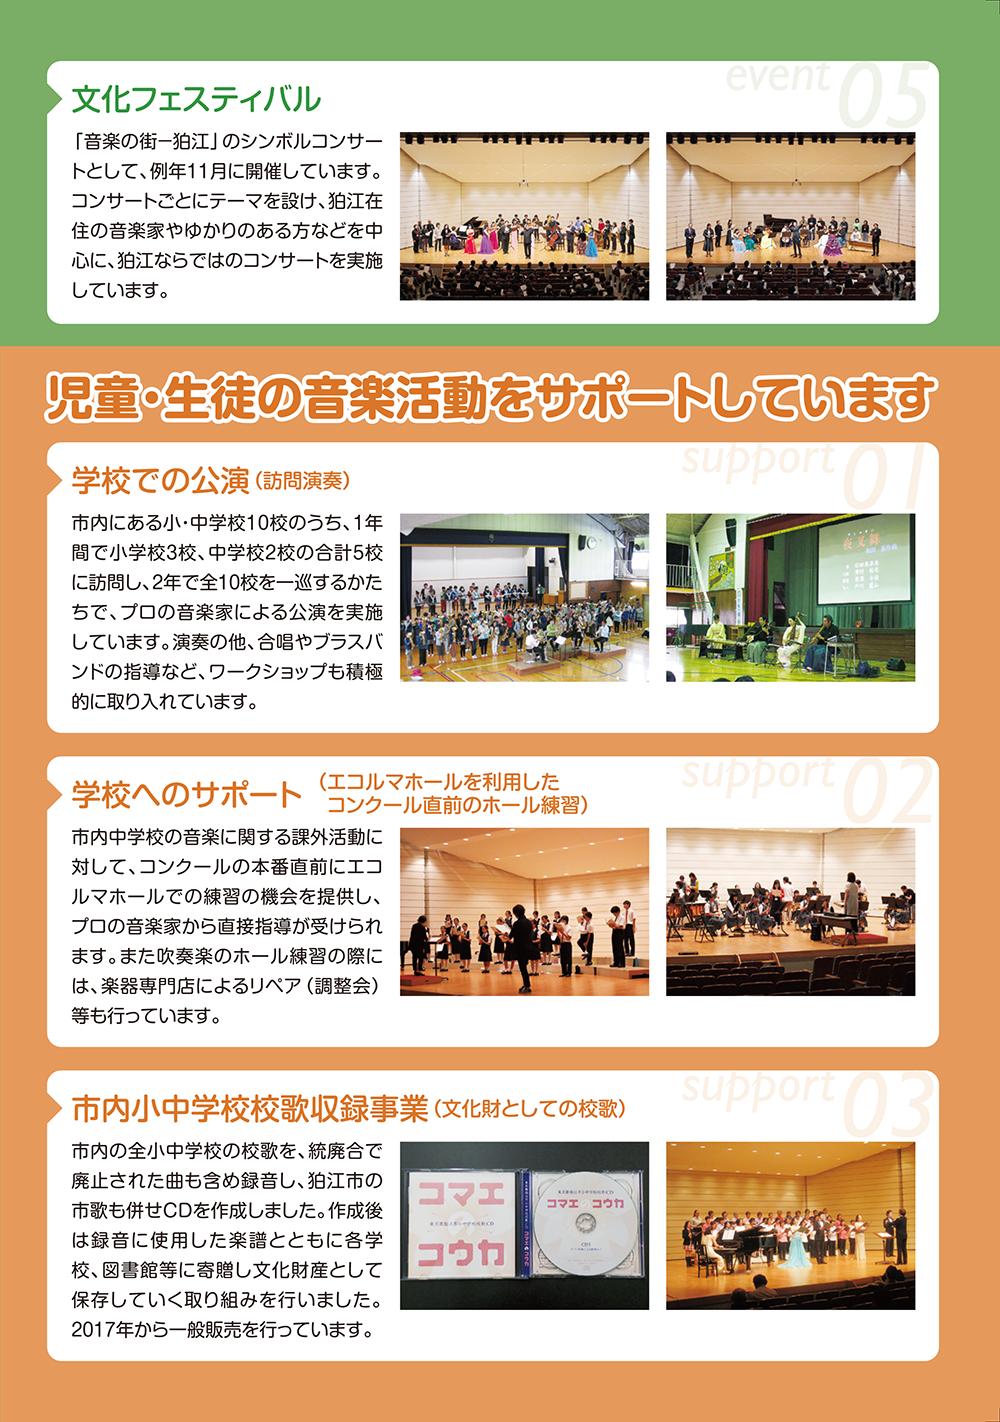 http://onkoma.jp/manual_03.png